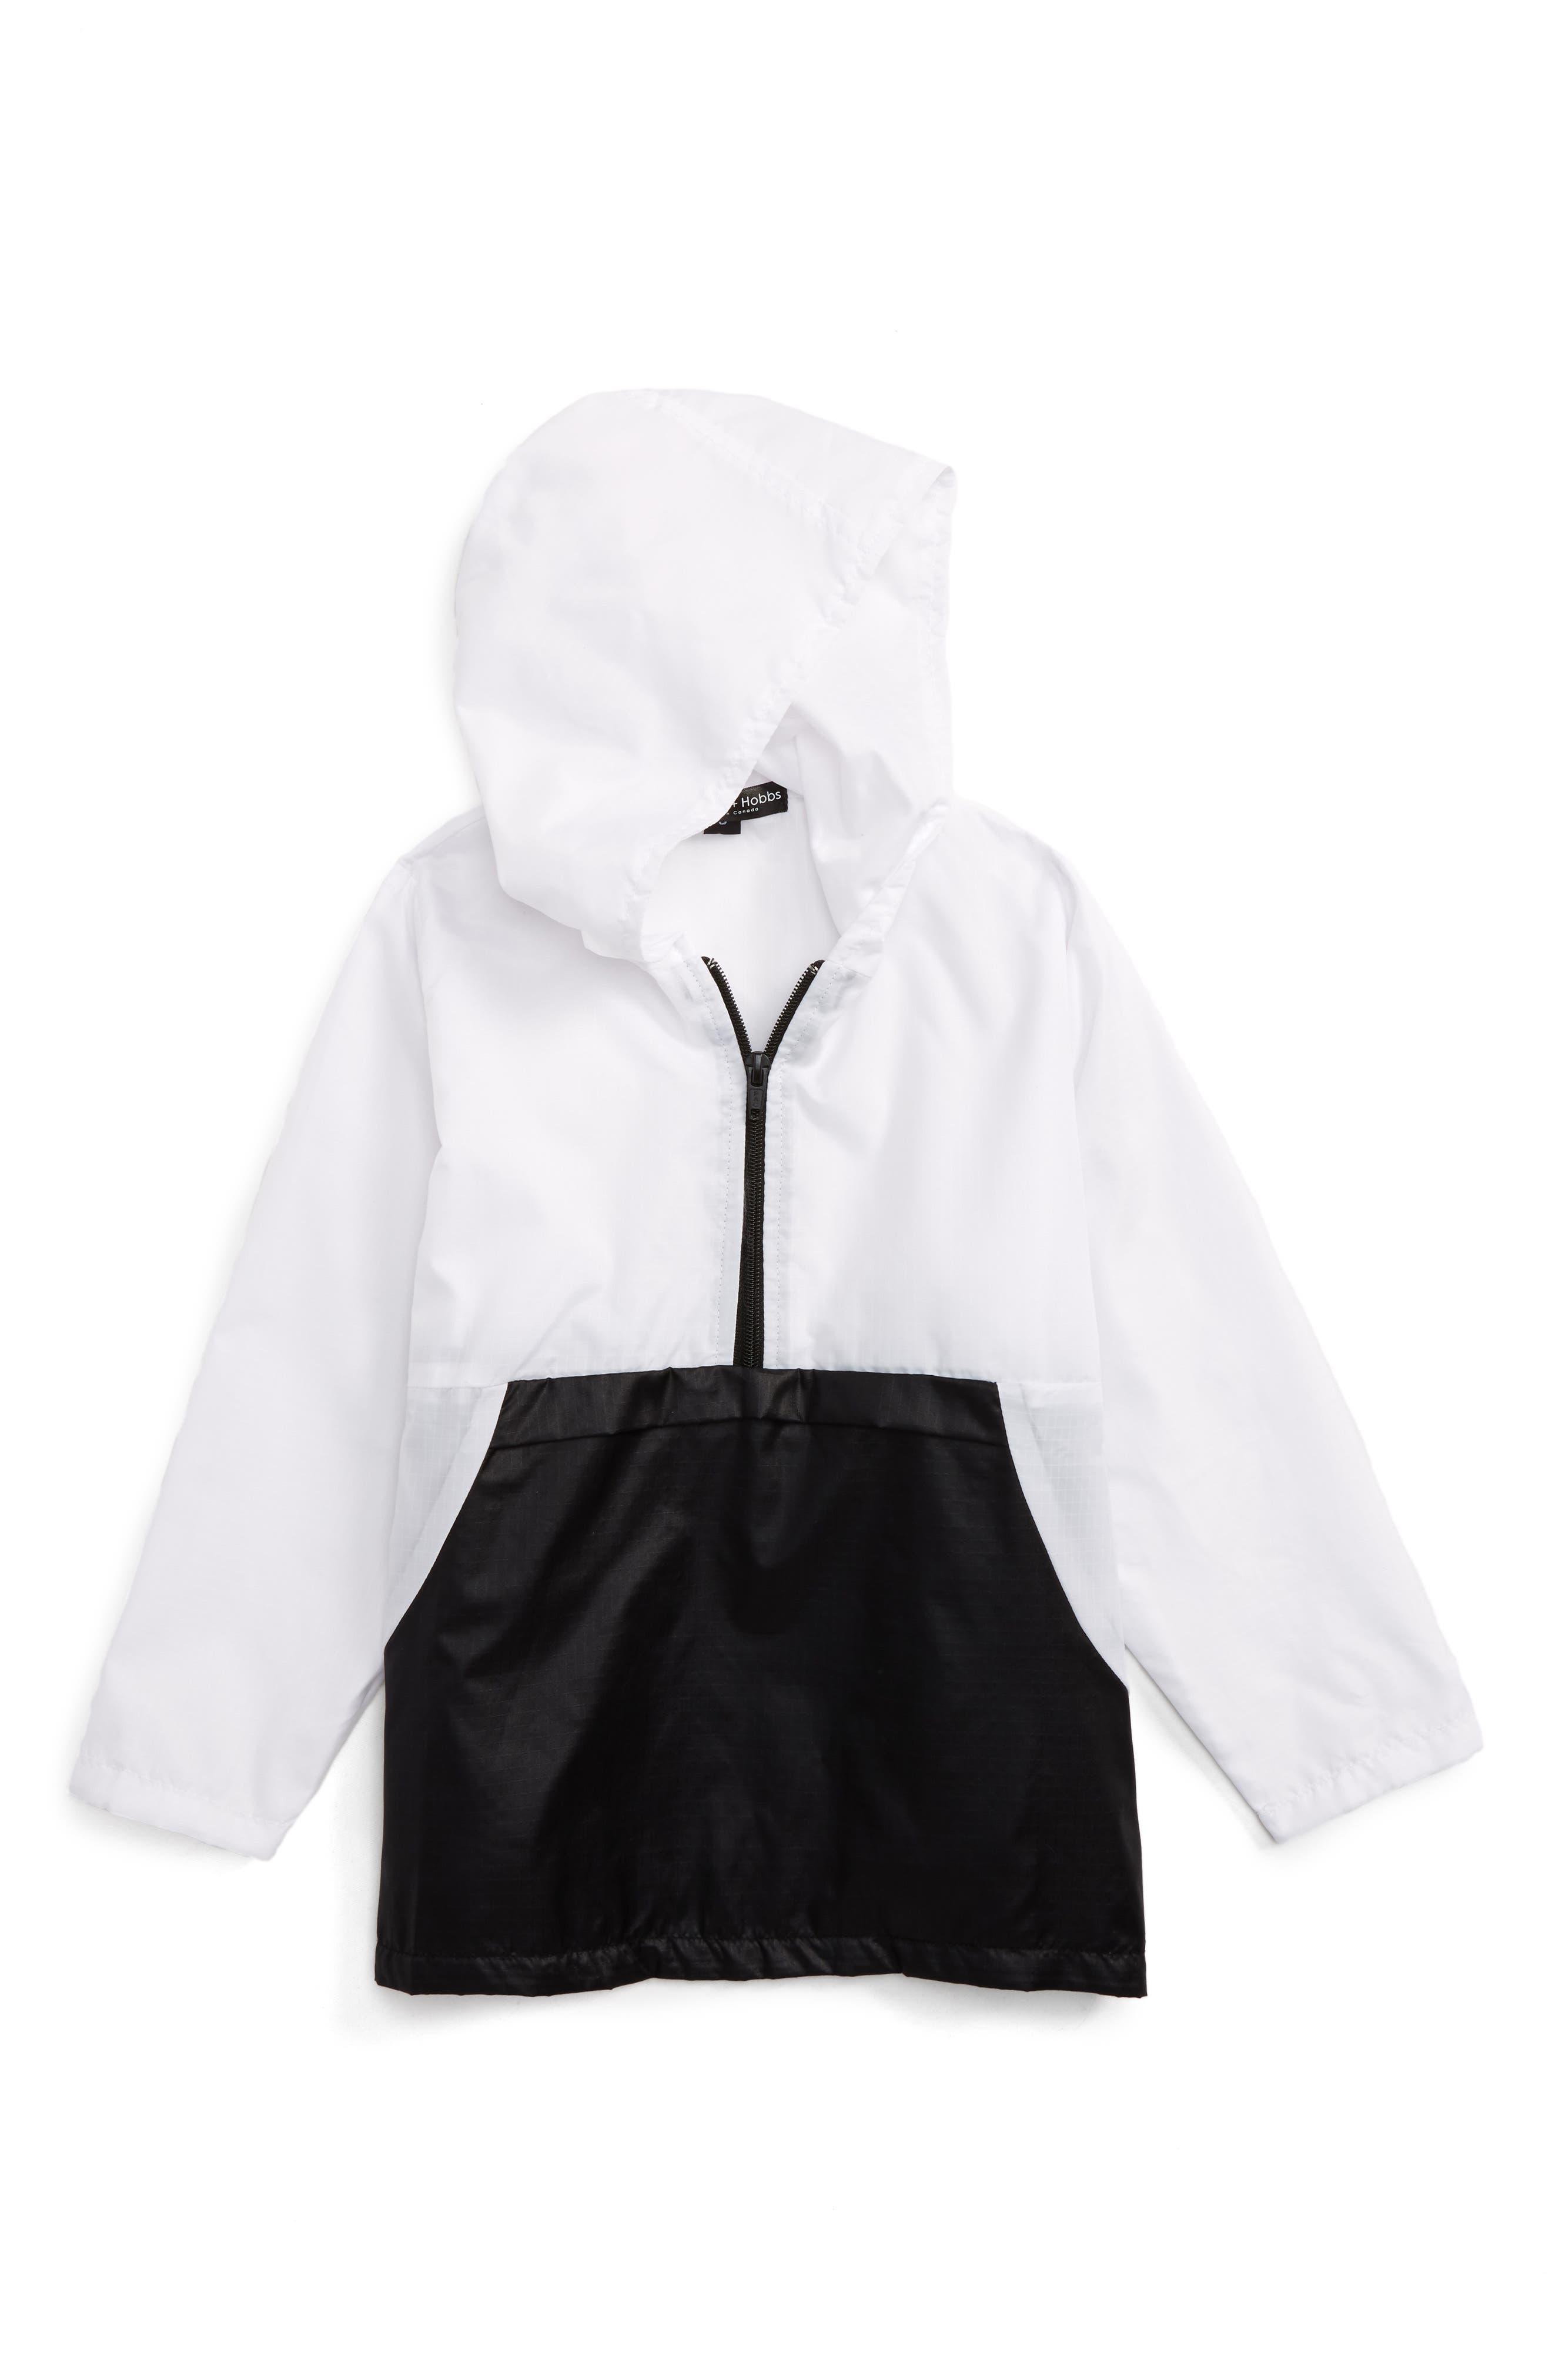 Two Tone Quarter Zip Jacket,                         Main,                         color, Black/ White